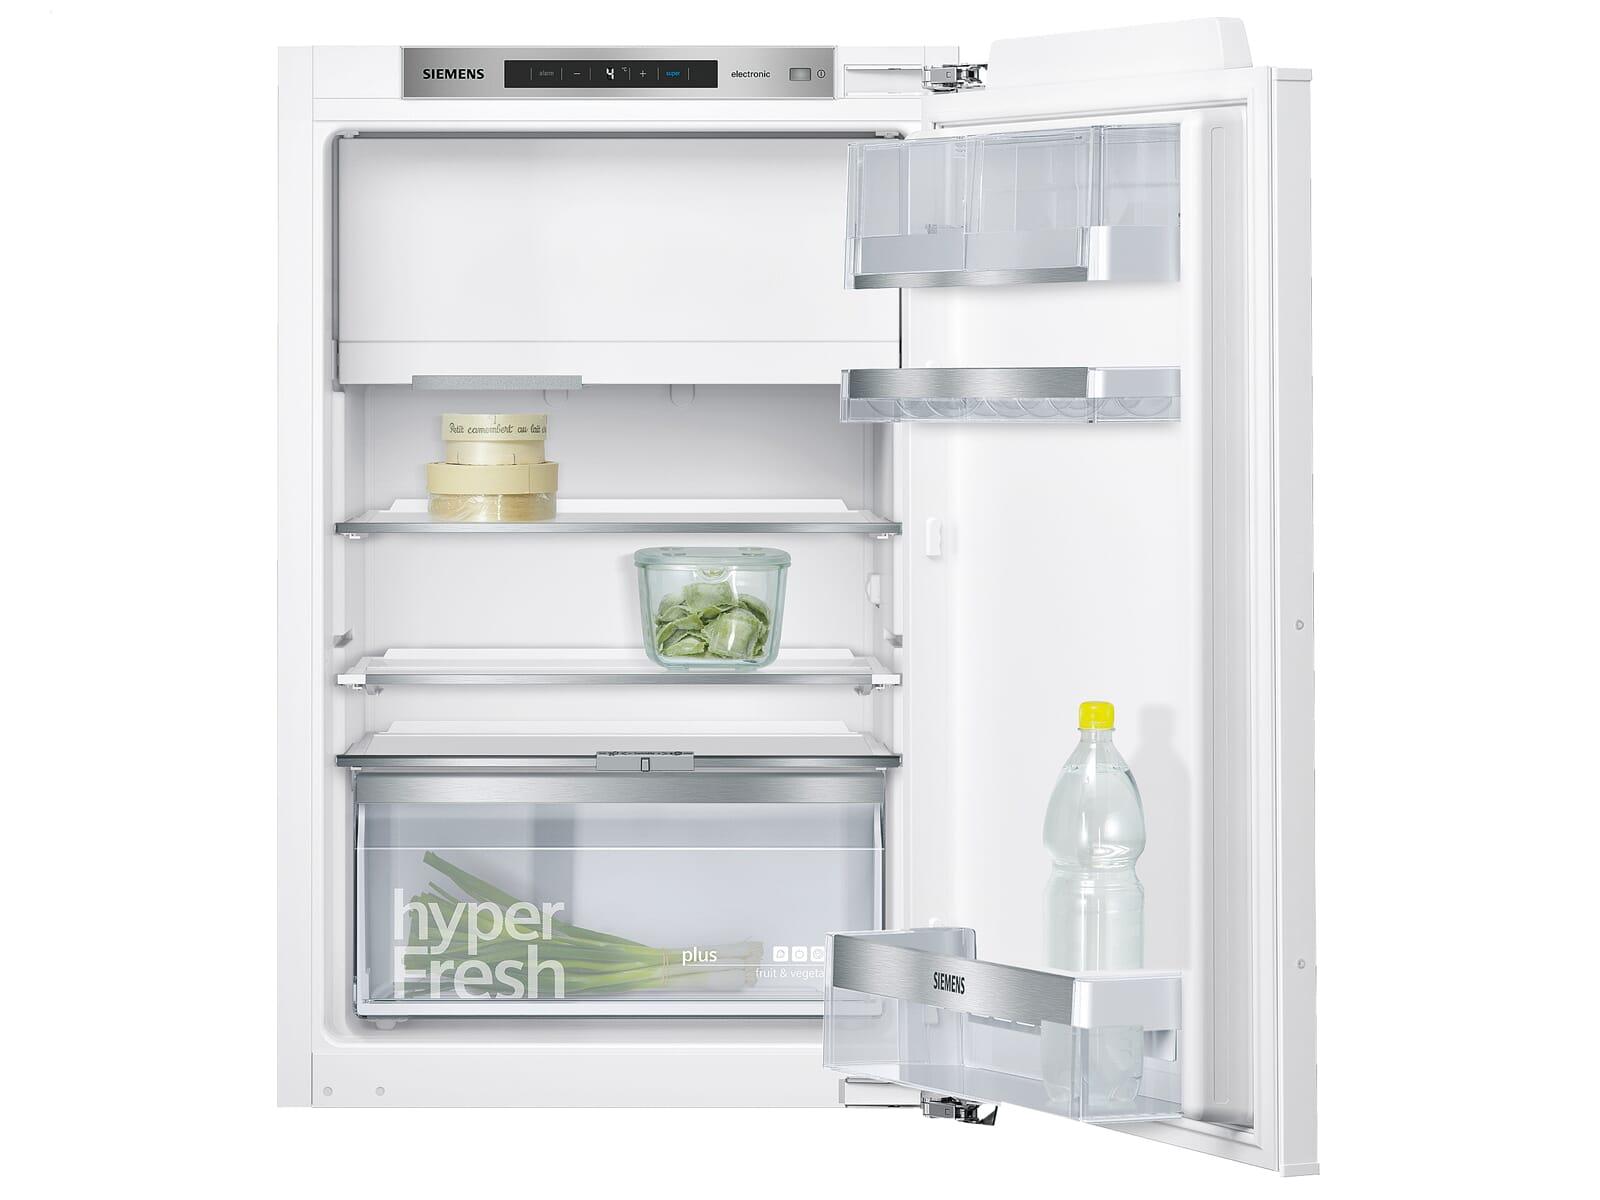 Siemens Kühlschrank Groß : Siemens ki22lad40 einbaukühlschrank